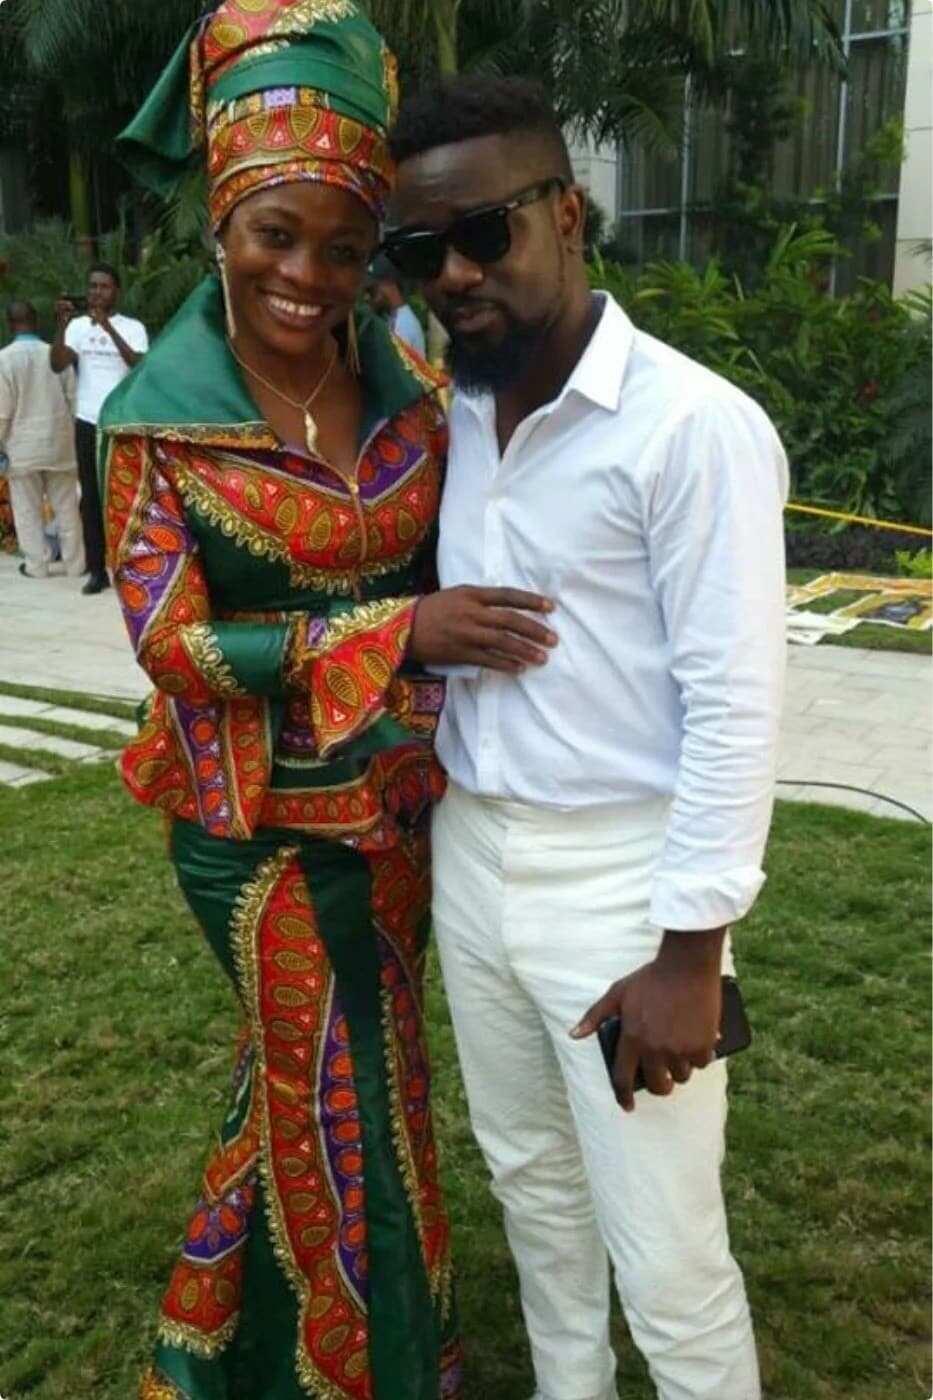 Evangelist Diana Asamoah praises Sarkordie for his lyrics